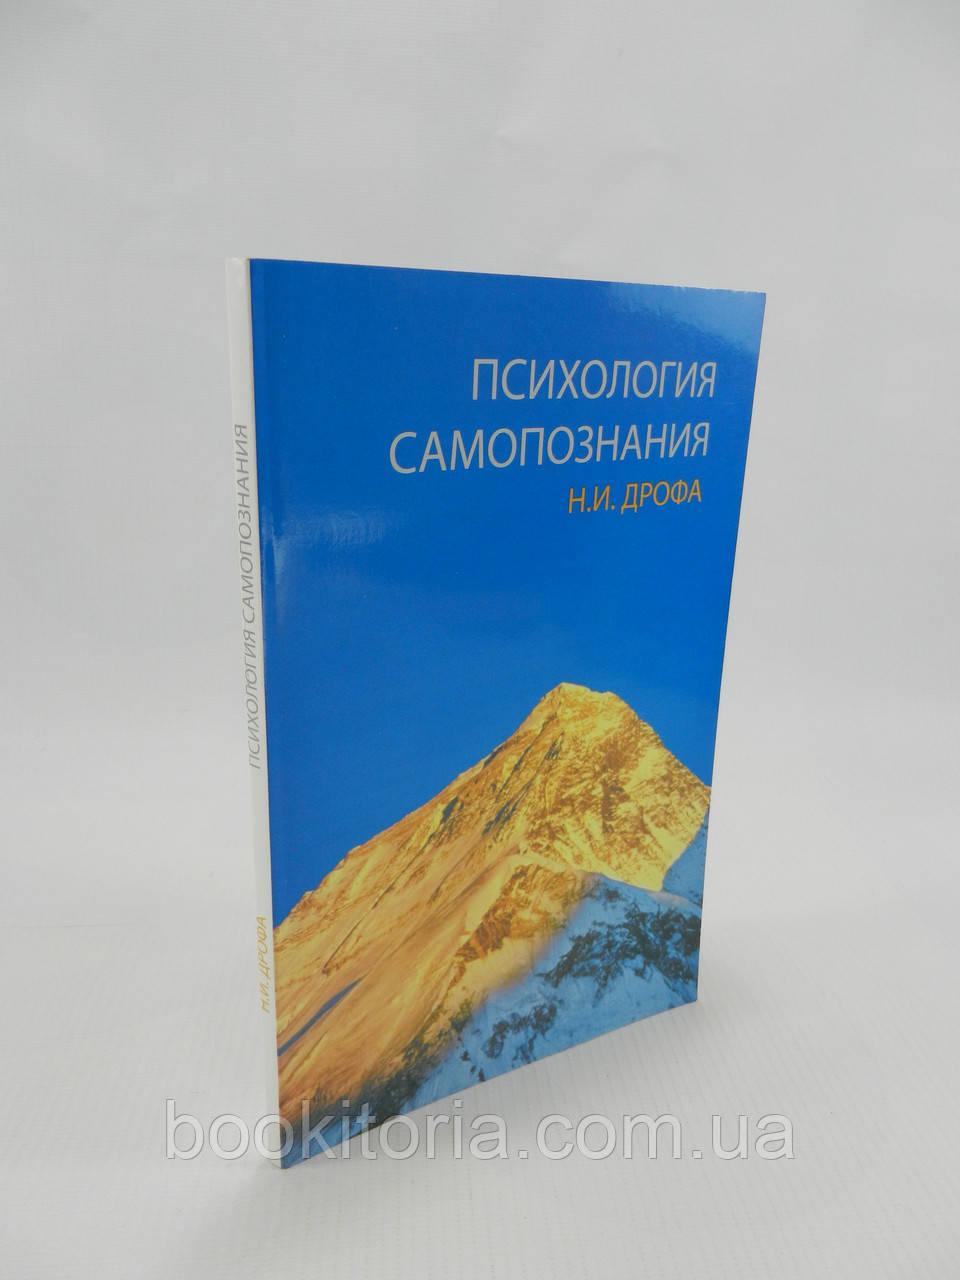 Дрофа Н. Психология самопознания (б/у).